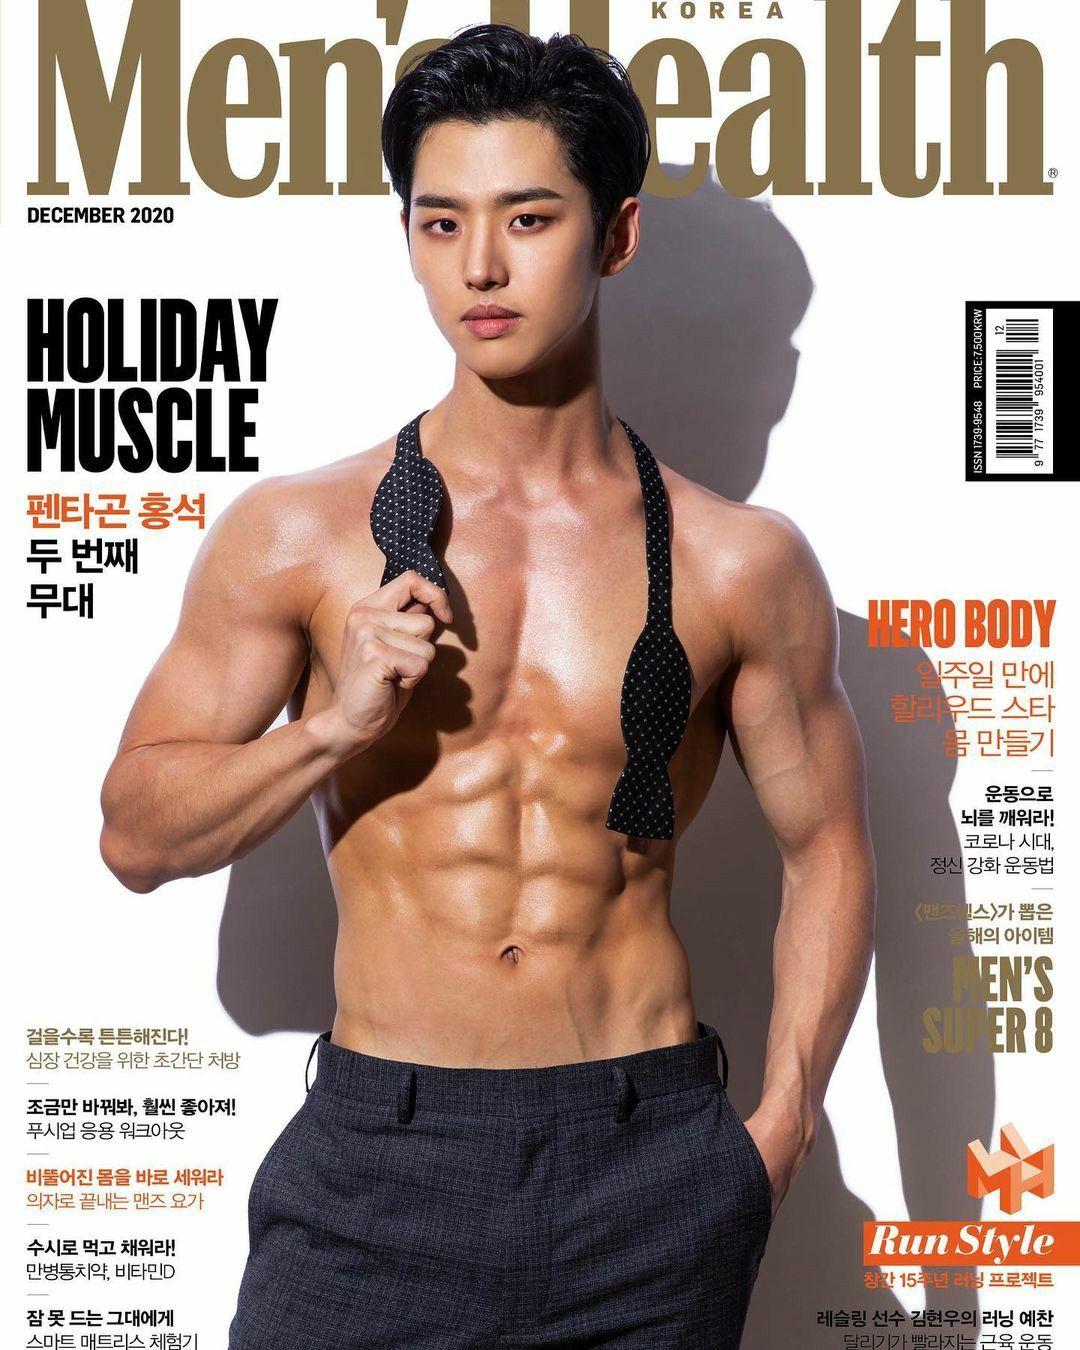 Pin By Simply Cia On Pentagon Pentagon Hongseok Men S Health Mens Health